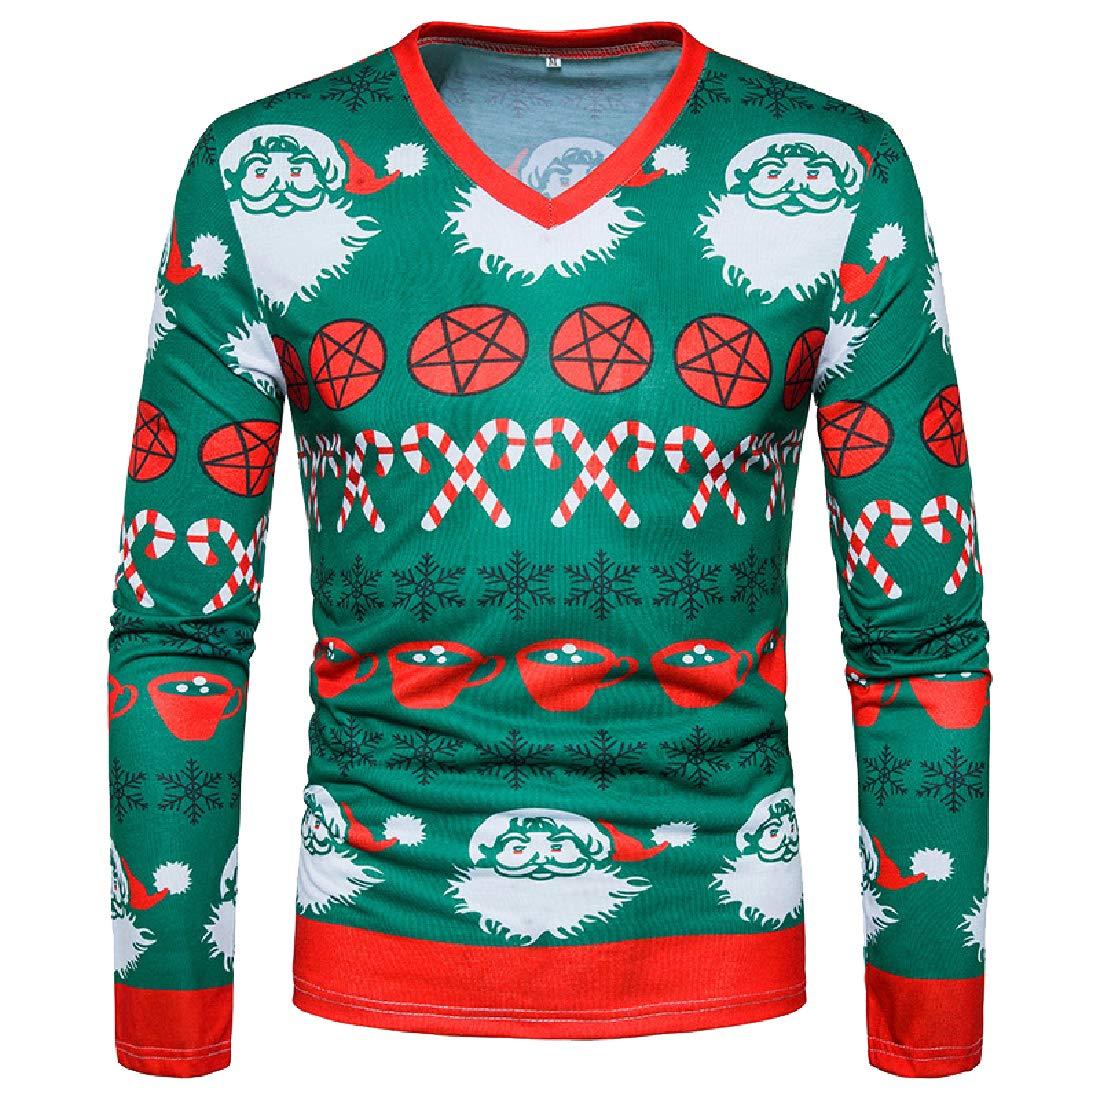 YUNY Mens Pullover Vogue Long-Sleeve Christmas Slim Fit Shirts Tops M